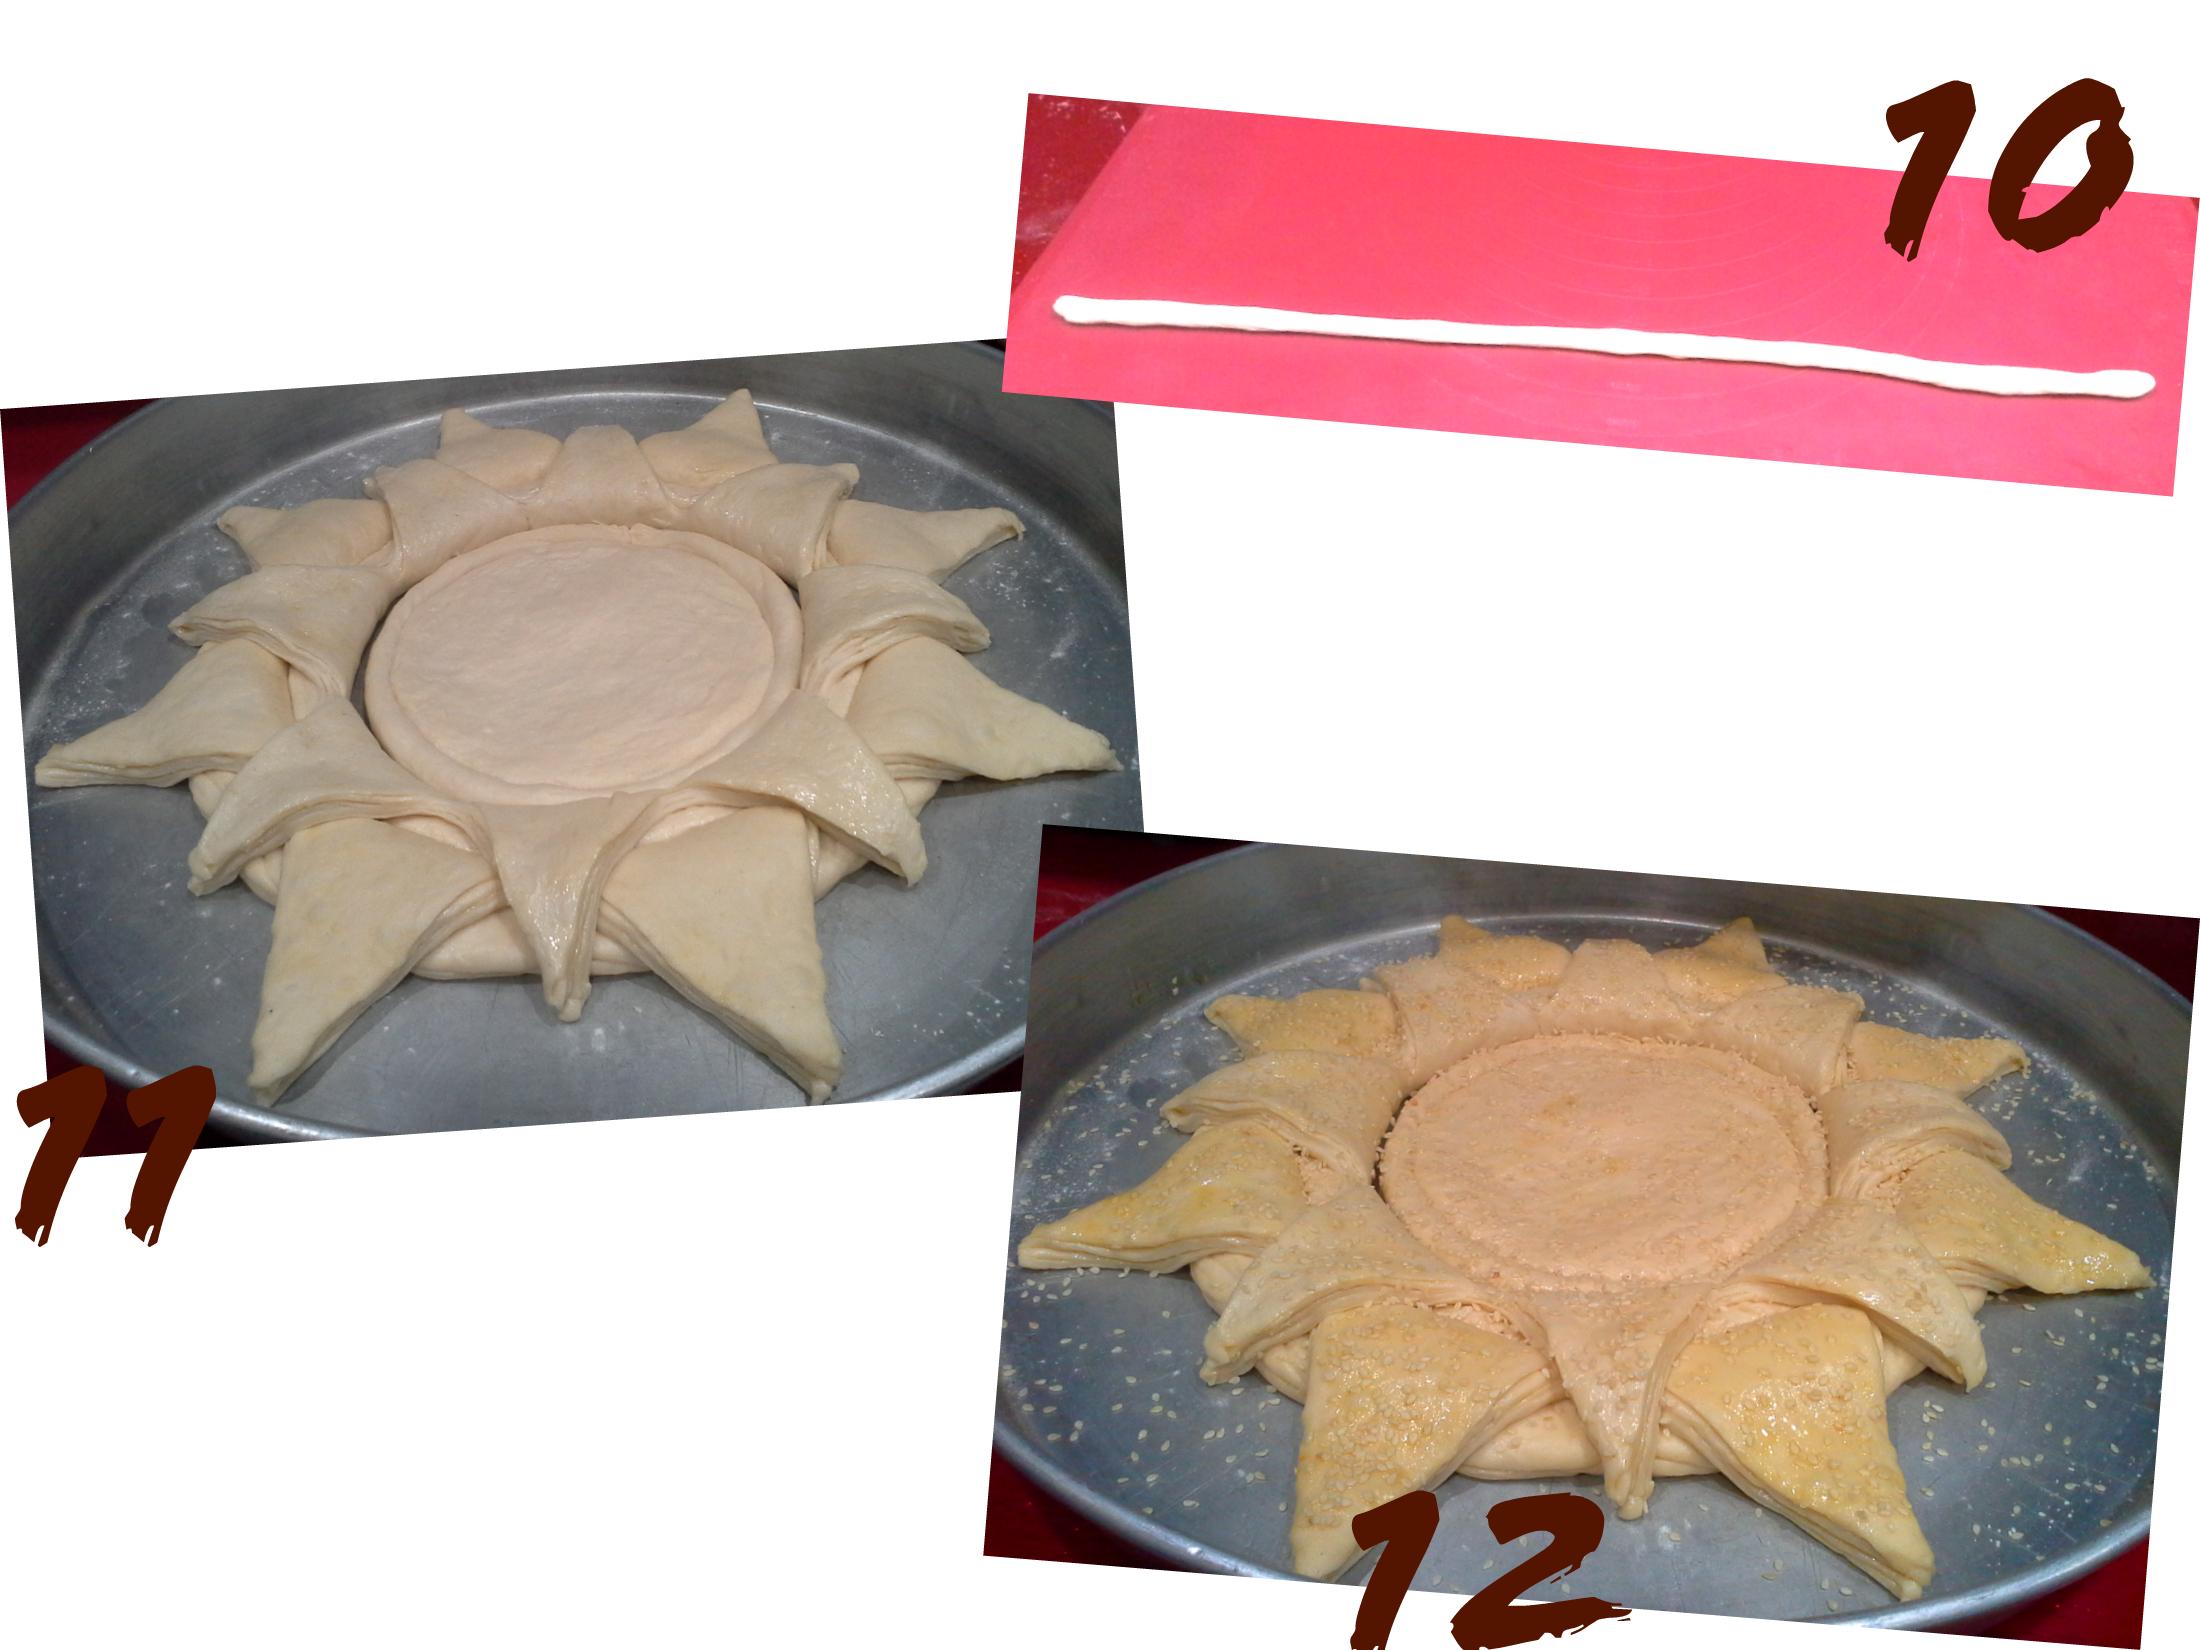 pain tournesol etape 4